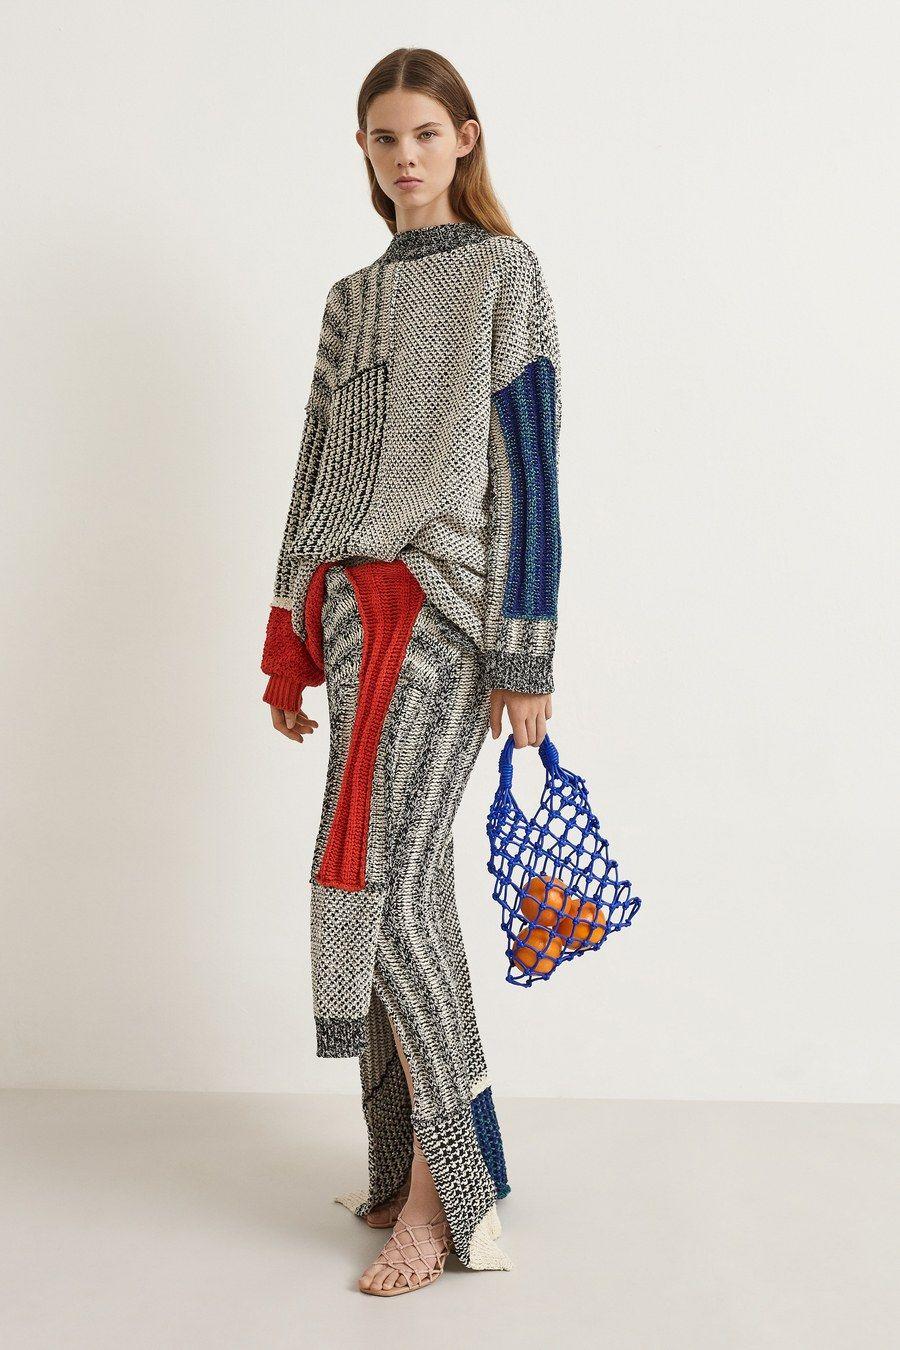 Stella McCartney Resort 2020 Fashion Show nel 2020 | Stile